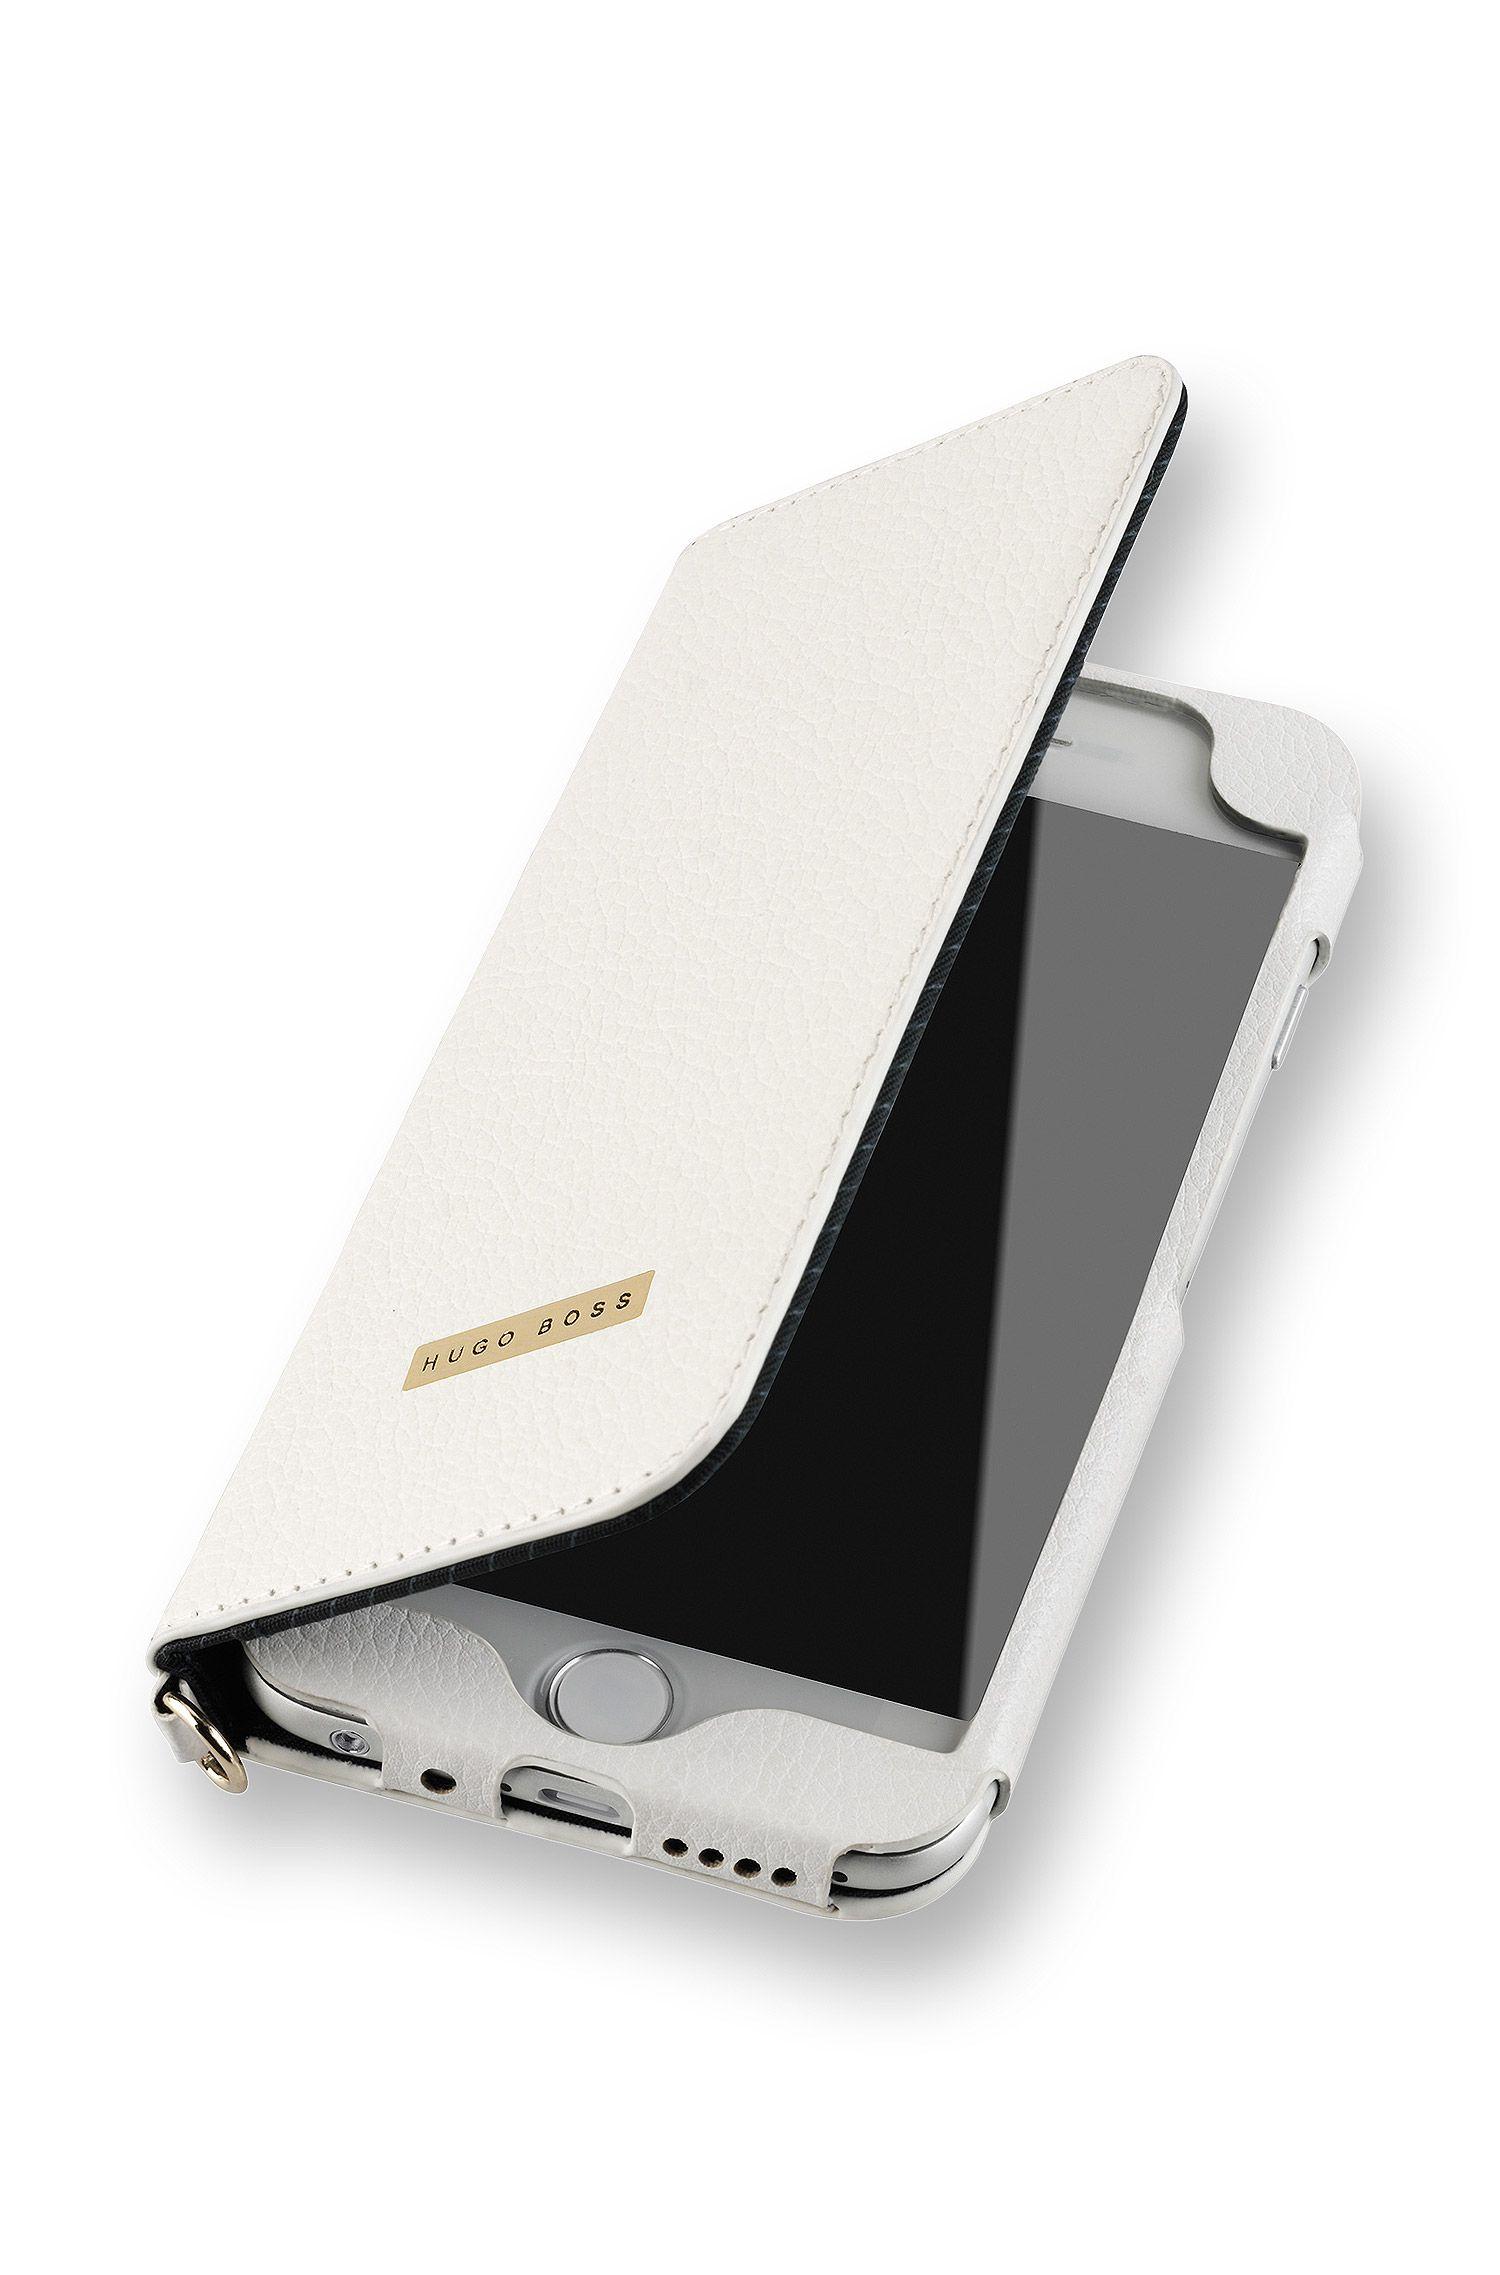 Bookletcase 'Folianti IP6 4.7 - White' voor iPhone 6 4.7